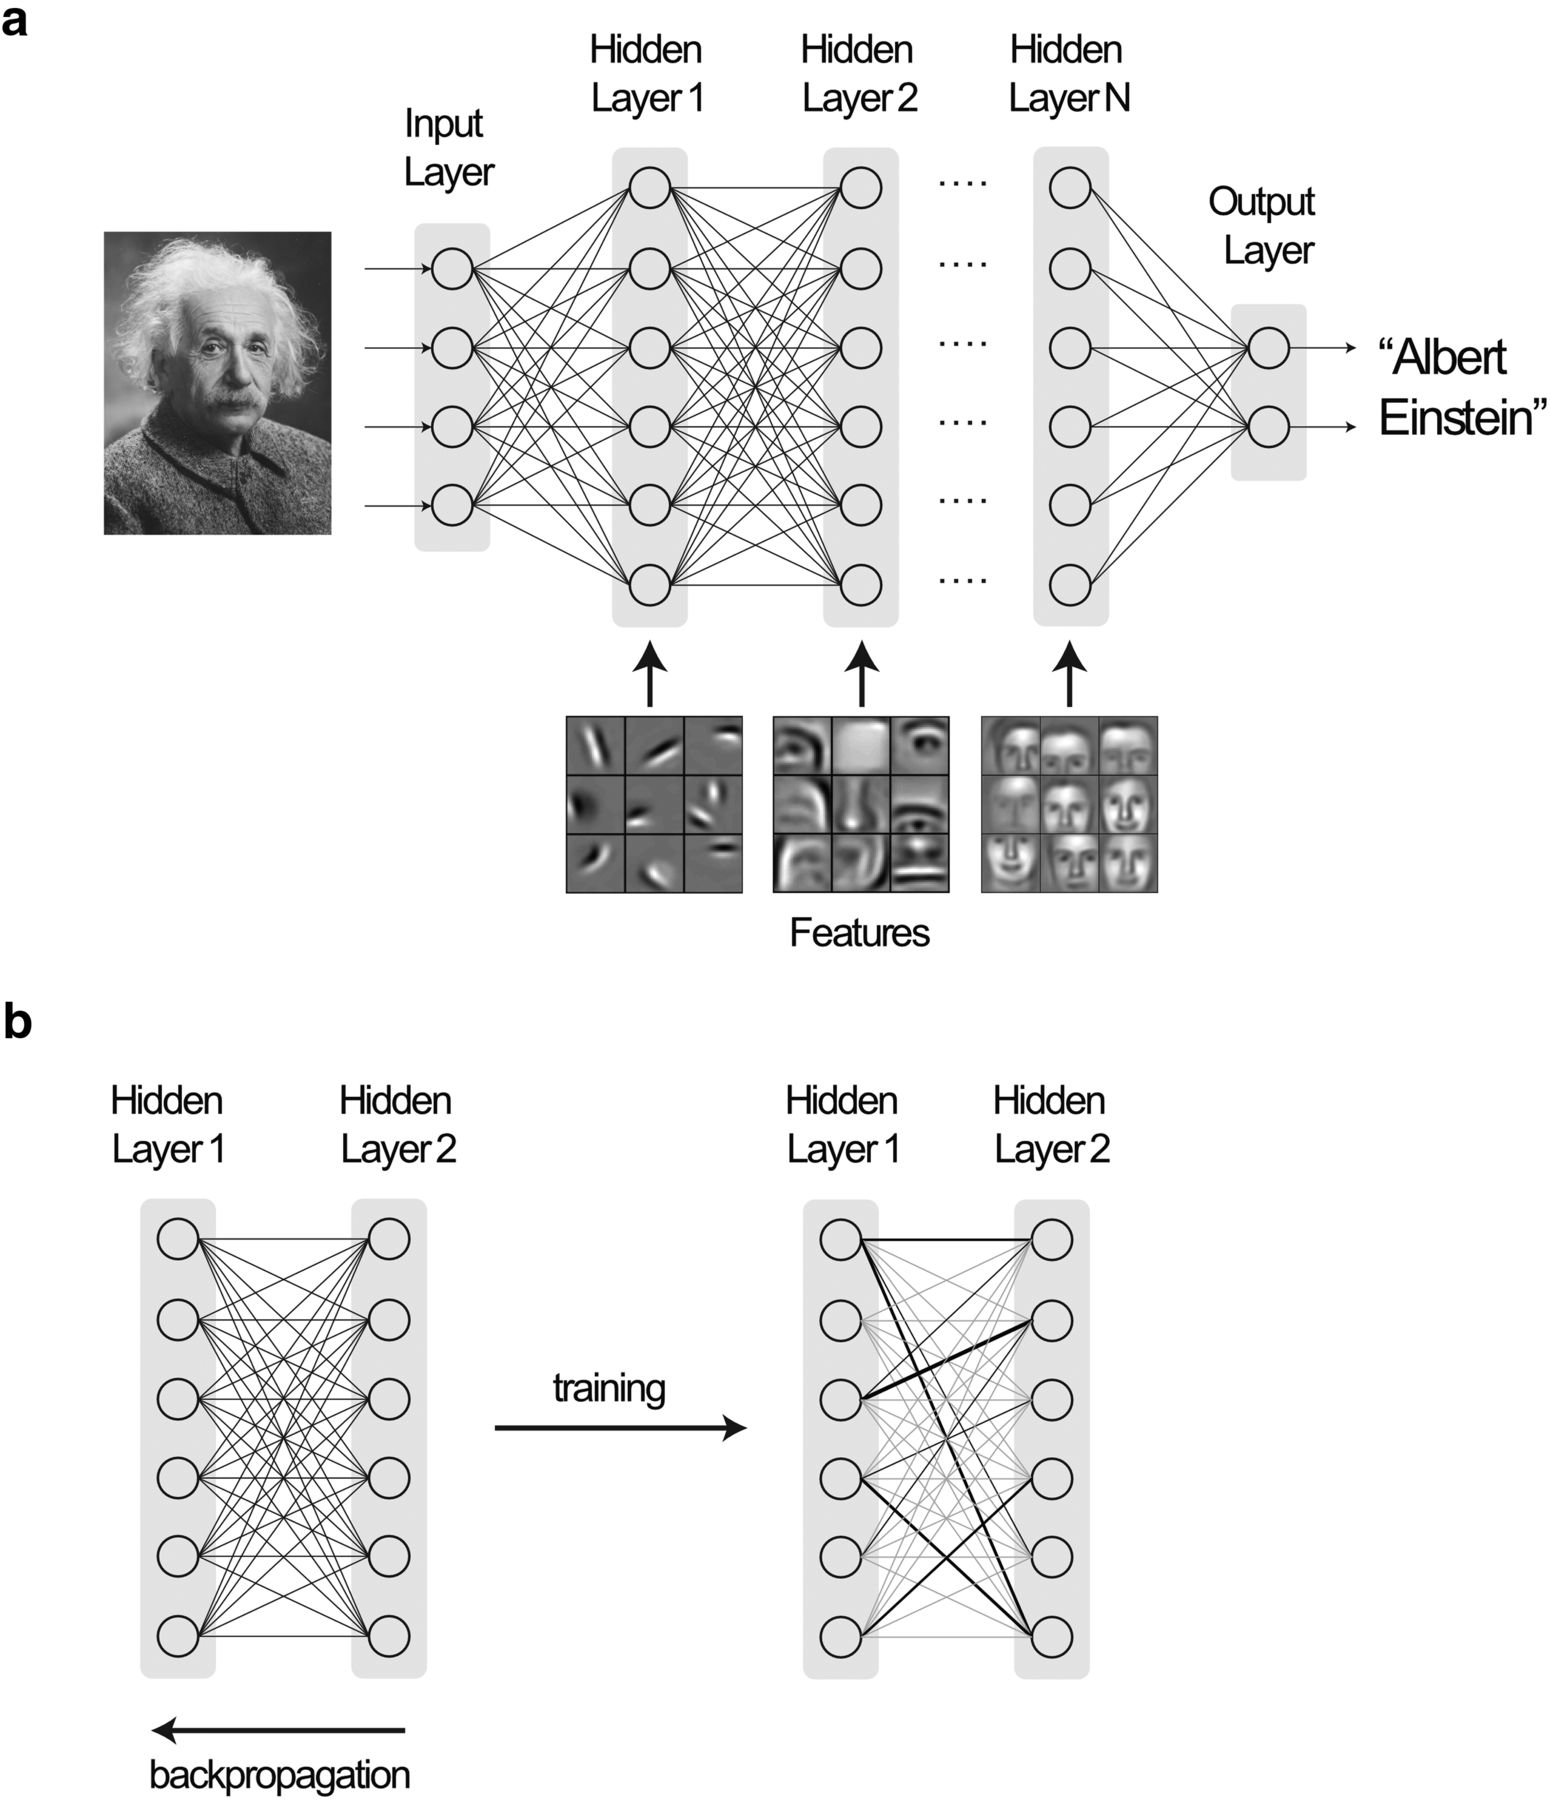 Deeper Learning Journal Of Neuroscience Electrical Engineering 4 Year Plan Uc Davis Download Figure